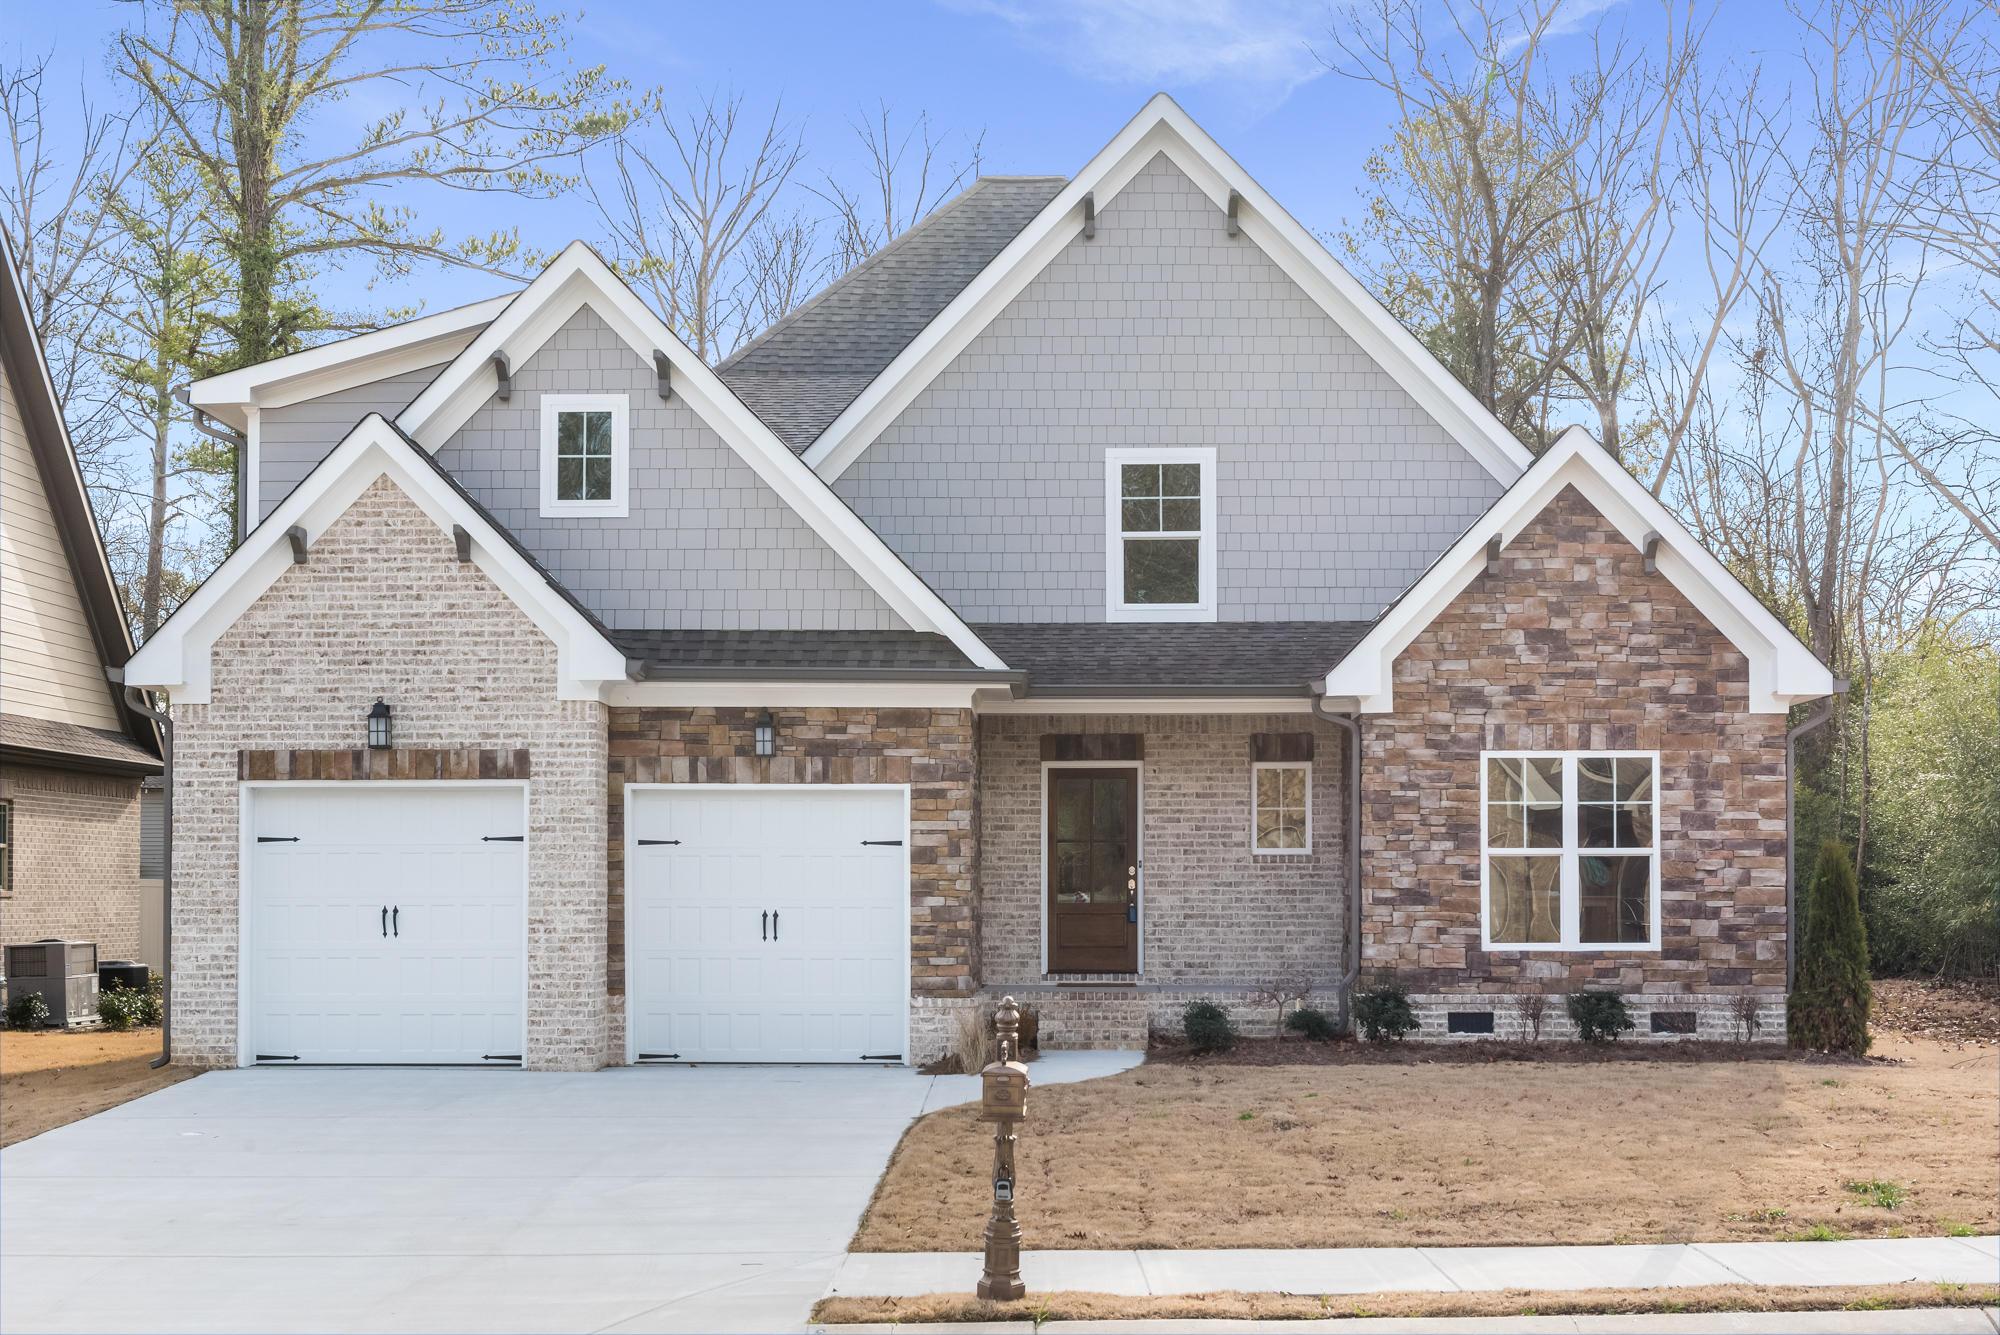 1006 Stone Ledge Ln, Chattanooga, TN 37421